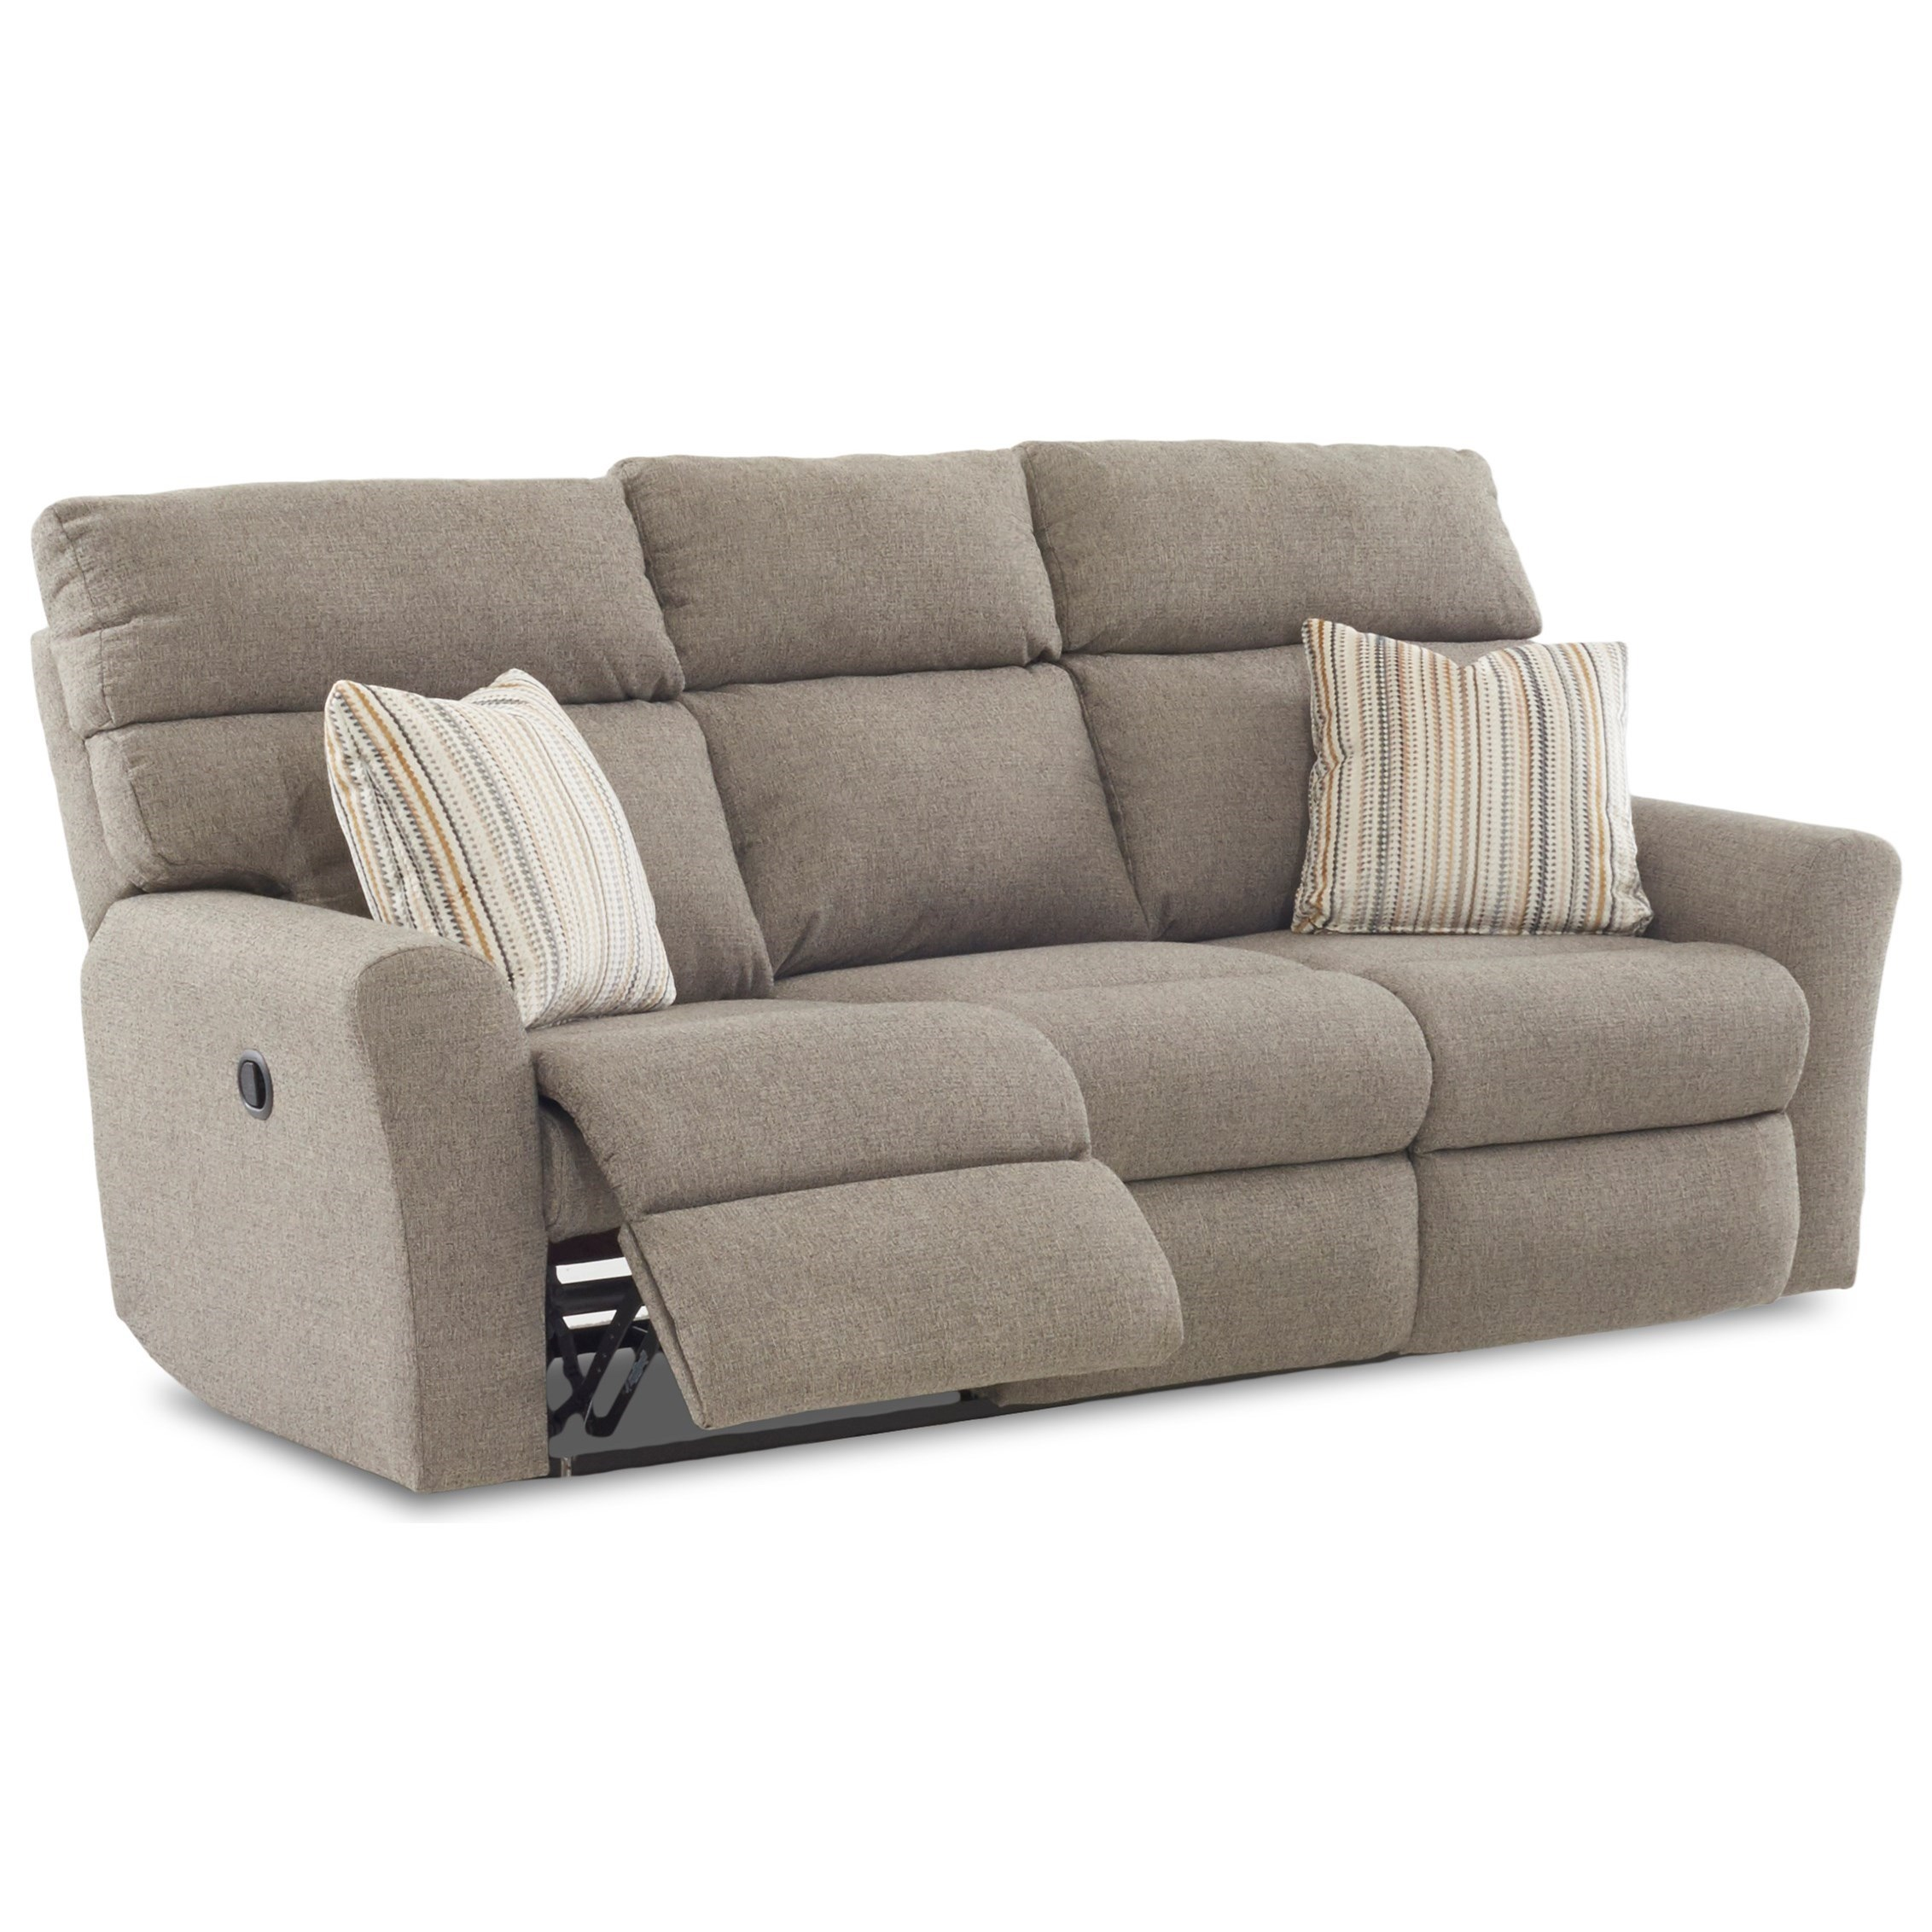 klaussner grand power reclining sofa austin tx xavier 48403p pw3rs casual three recliner